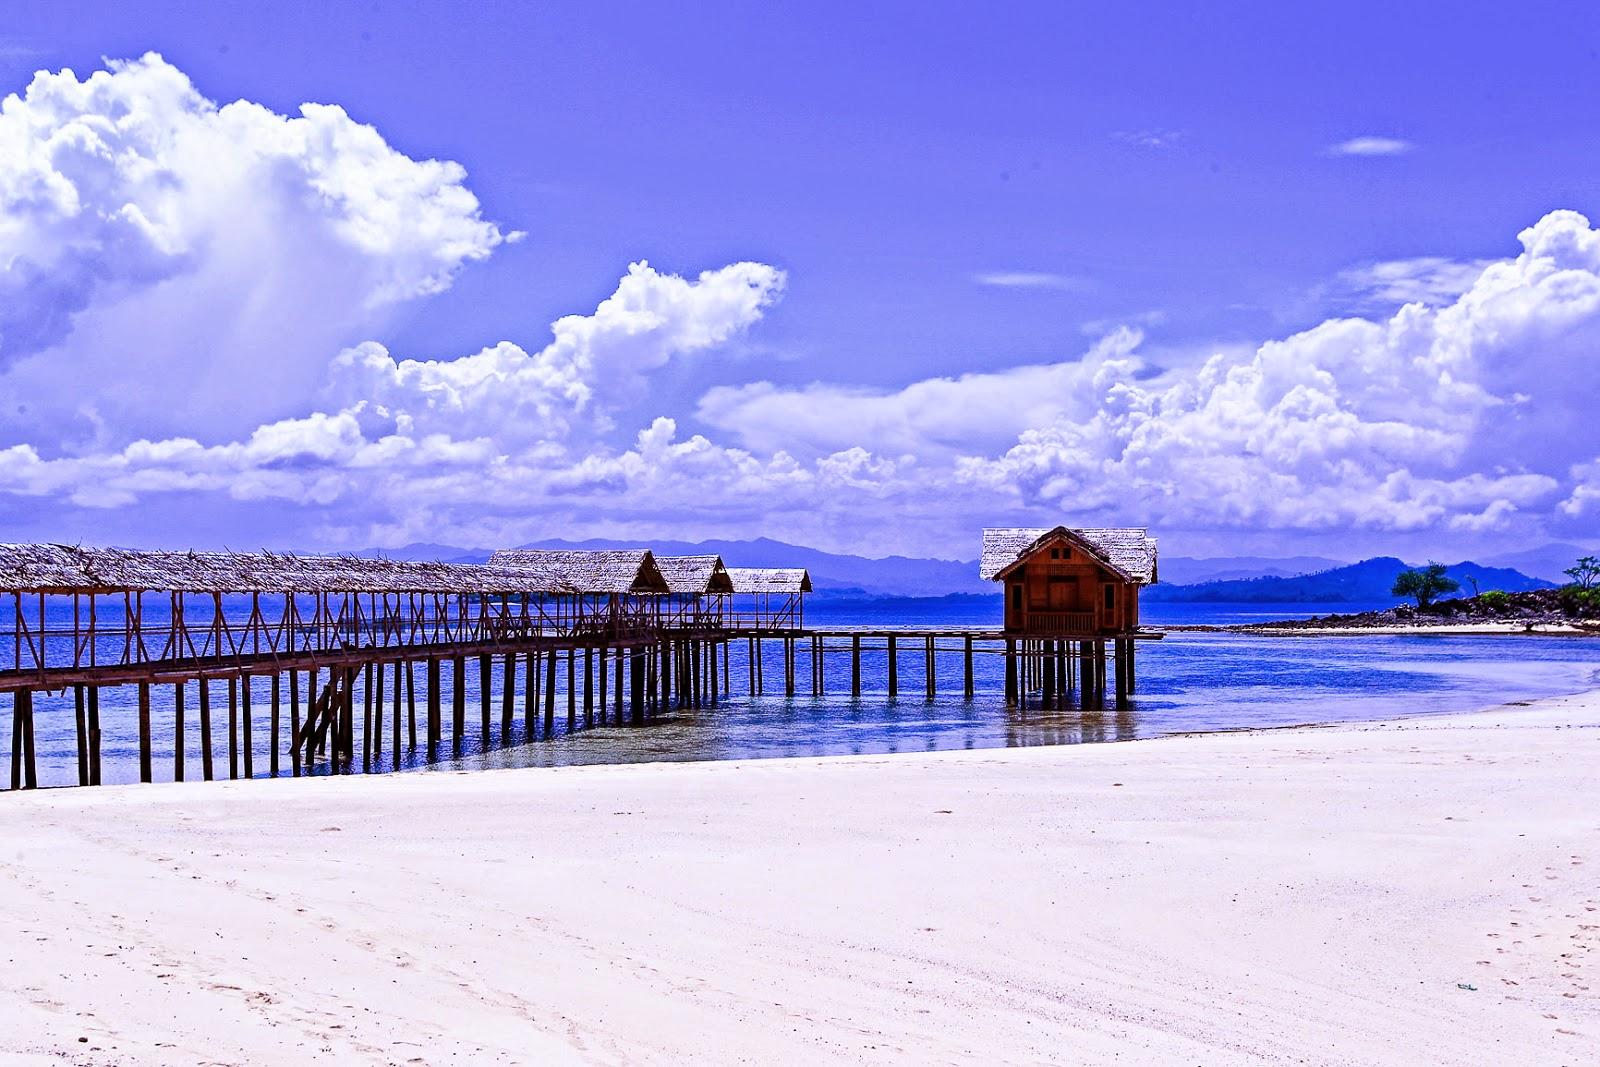 Tempat Wisata Gorontalo Pantai Terdapat Kabupaten Utara Kira 56 Km